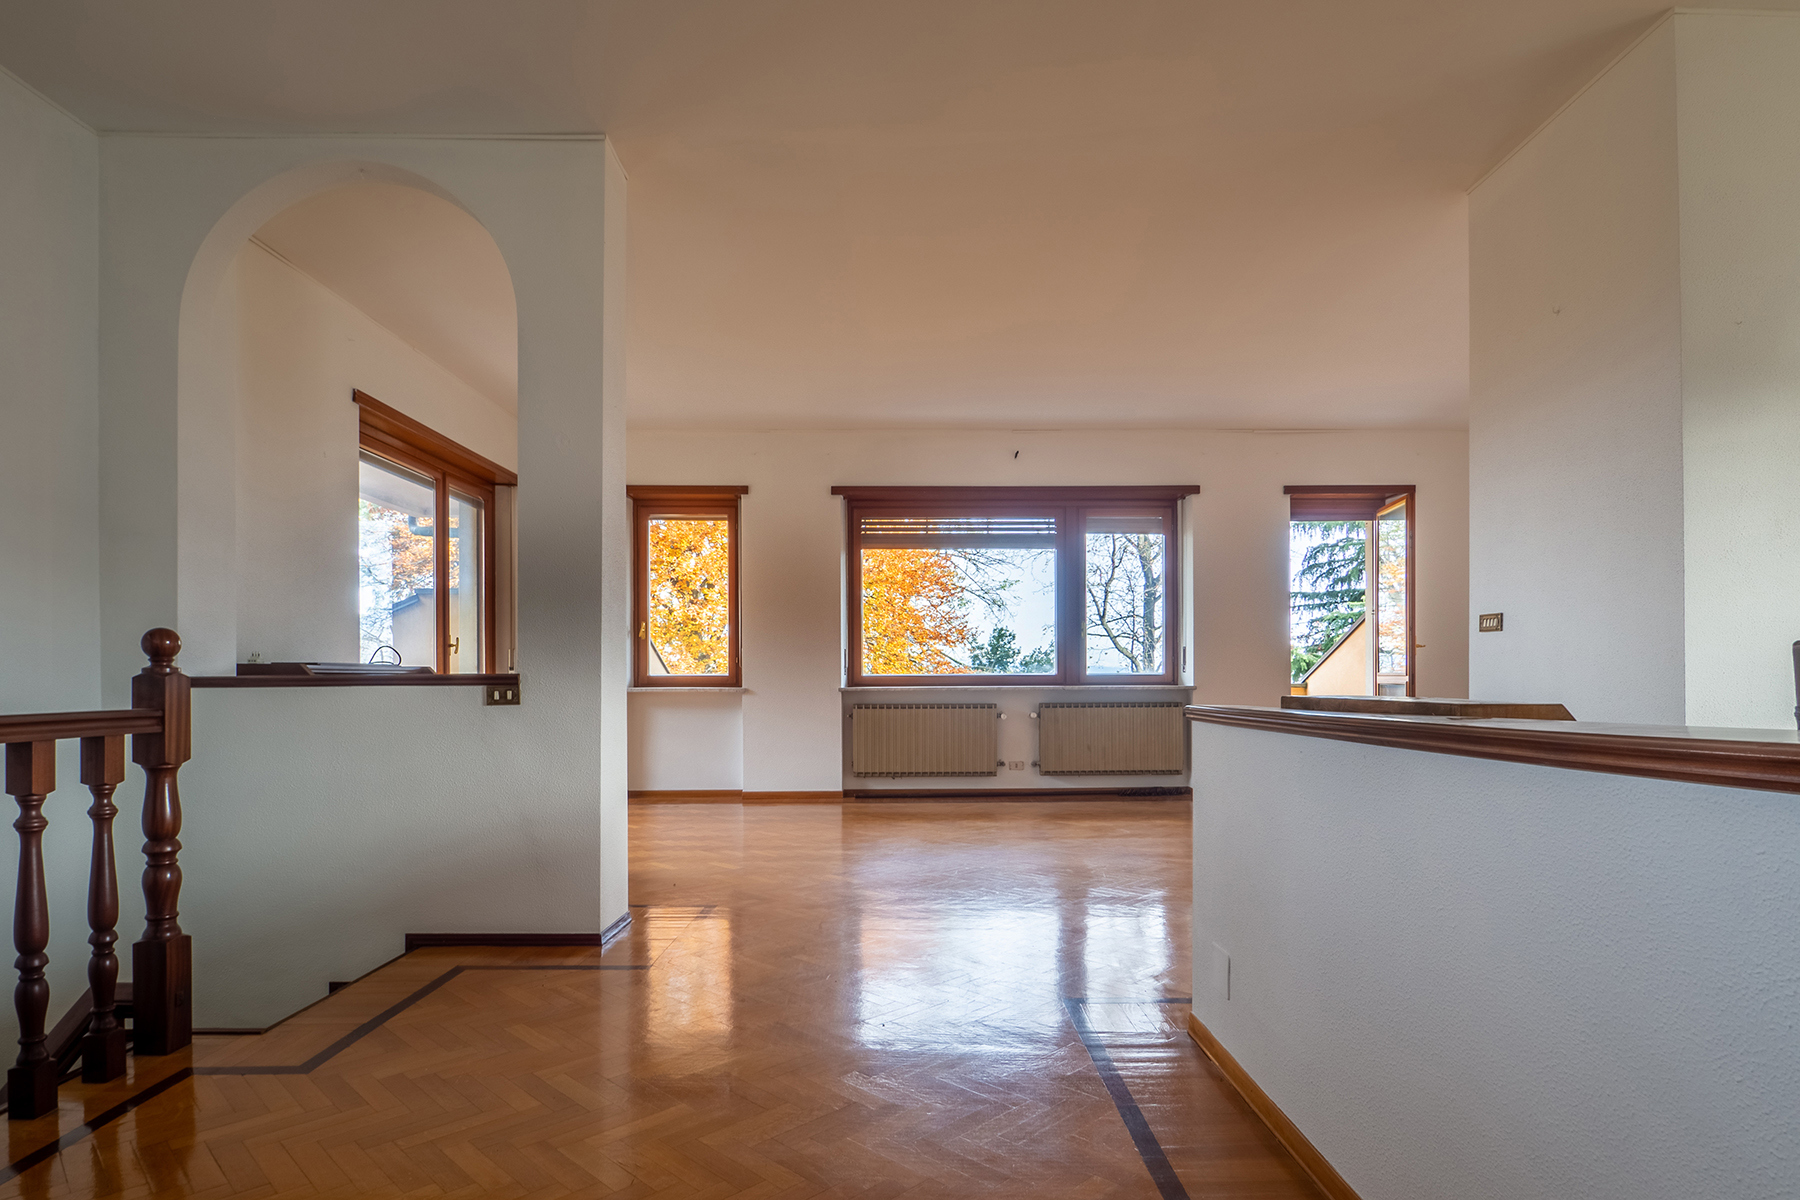 Casa indipendente in Vendita a Torino: 5 locali, 277 mq - Foto 3